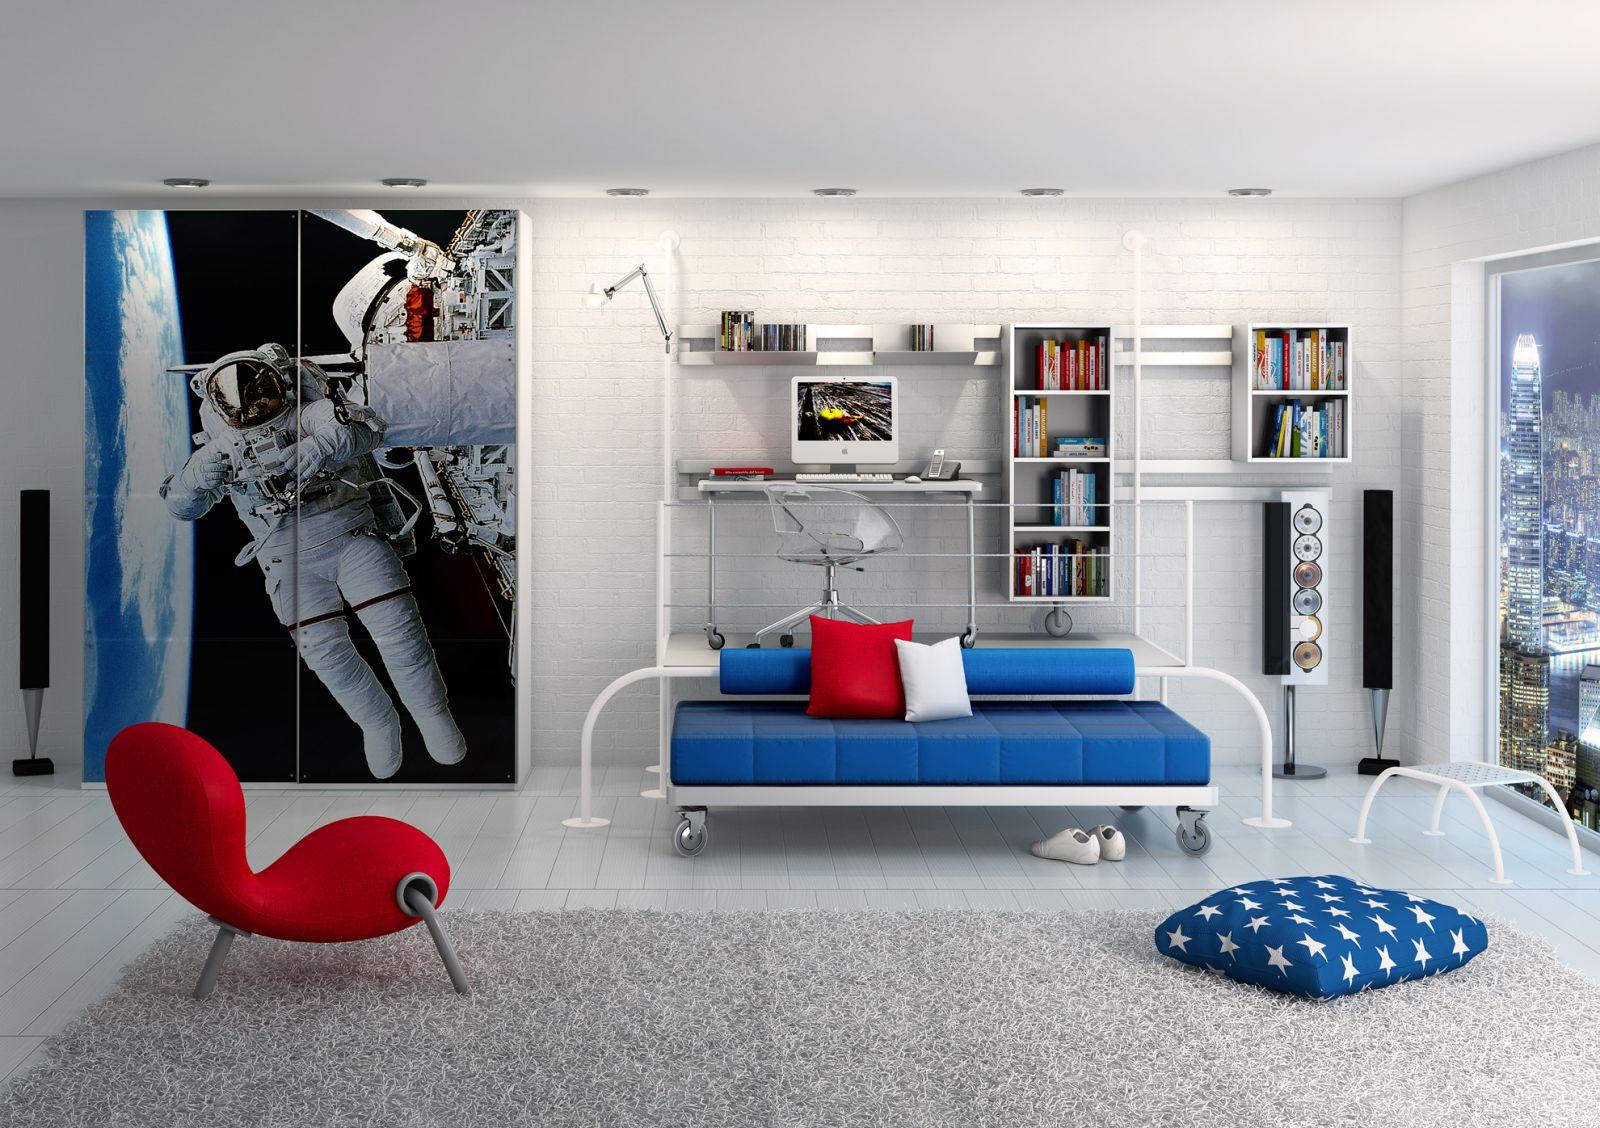 Original prints and posters in interior design are examples of successful interior decoration.